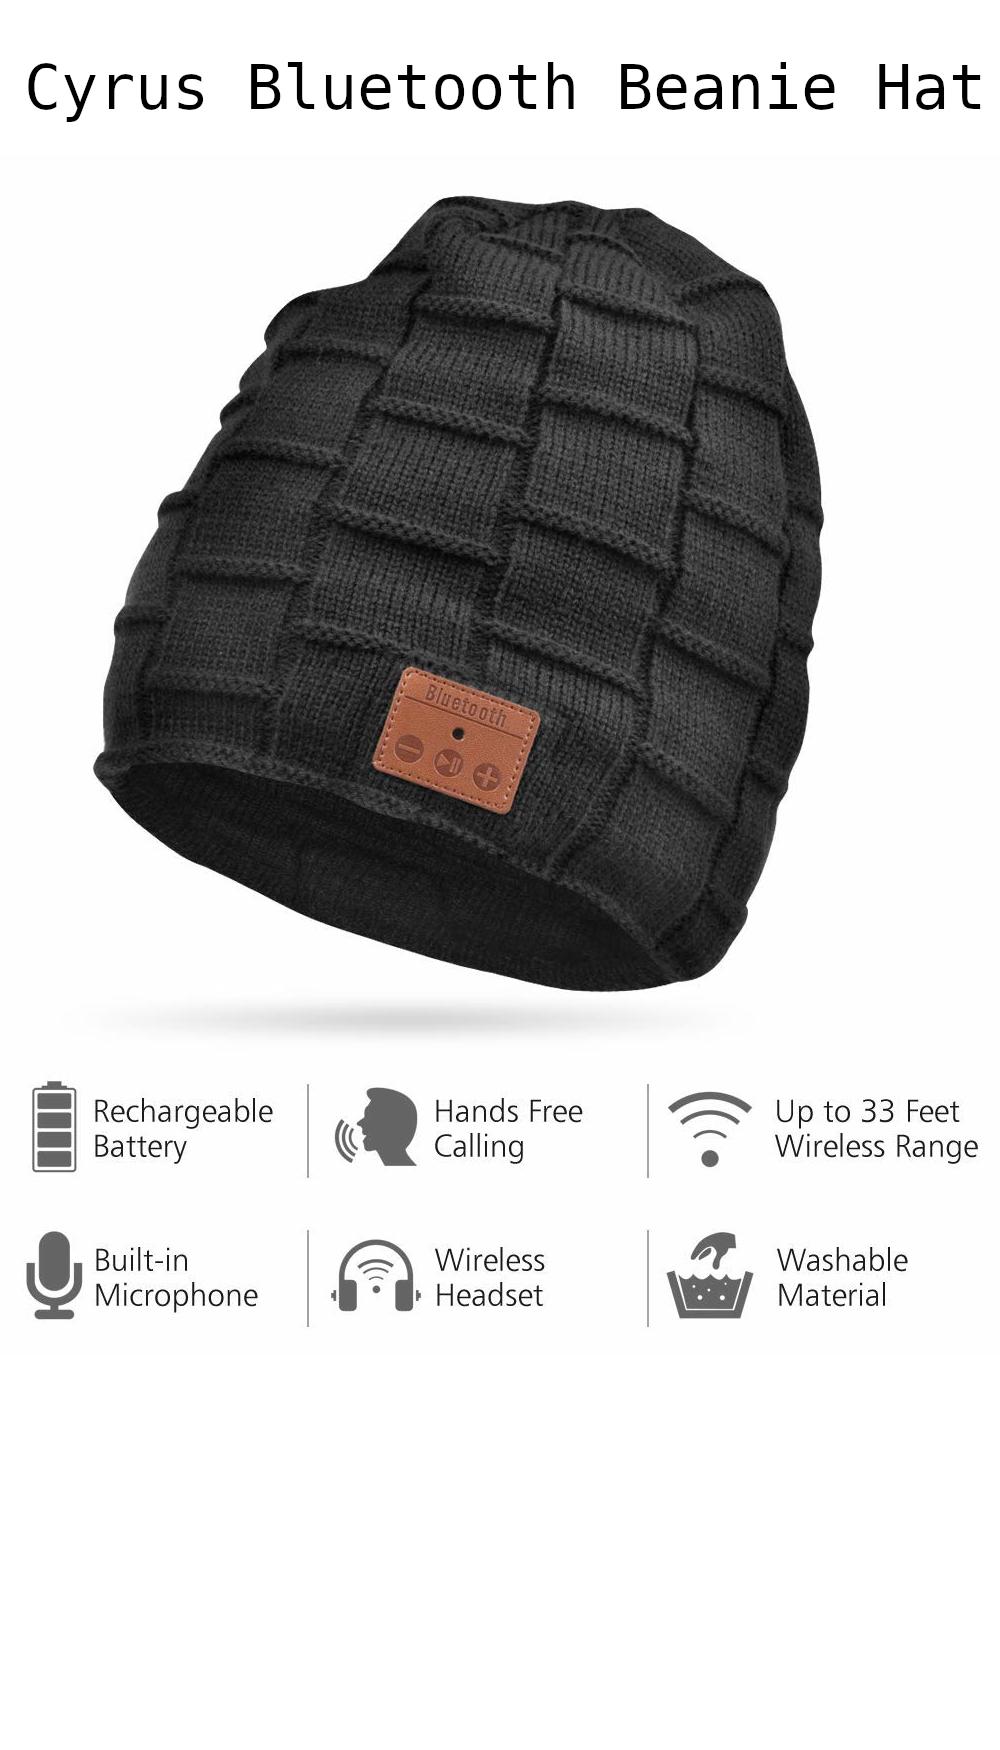 Cyrus Bluetooth Beanie Hat Winter Warm Music Hat-Smart Beanie Hat-Unisex  Washable Hat-for Ourdoor Sports Fitness(Black)  bluetooth  workout  music   staywarm 997dc461dde